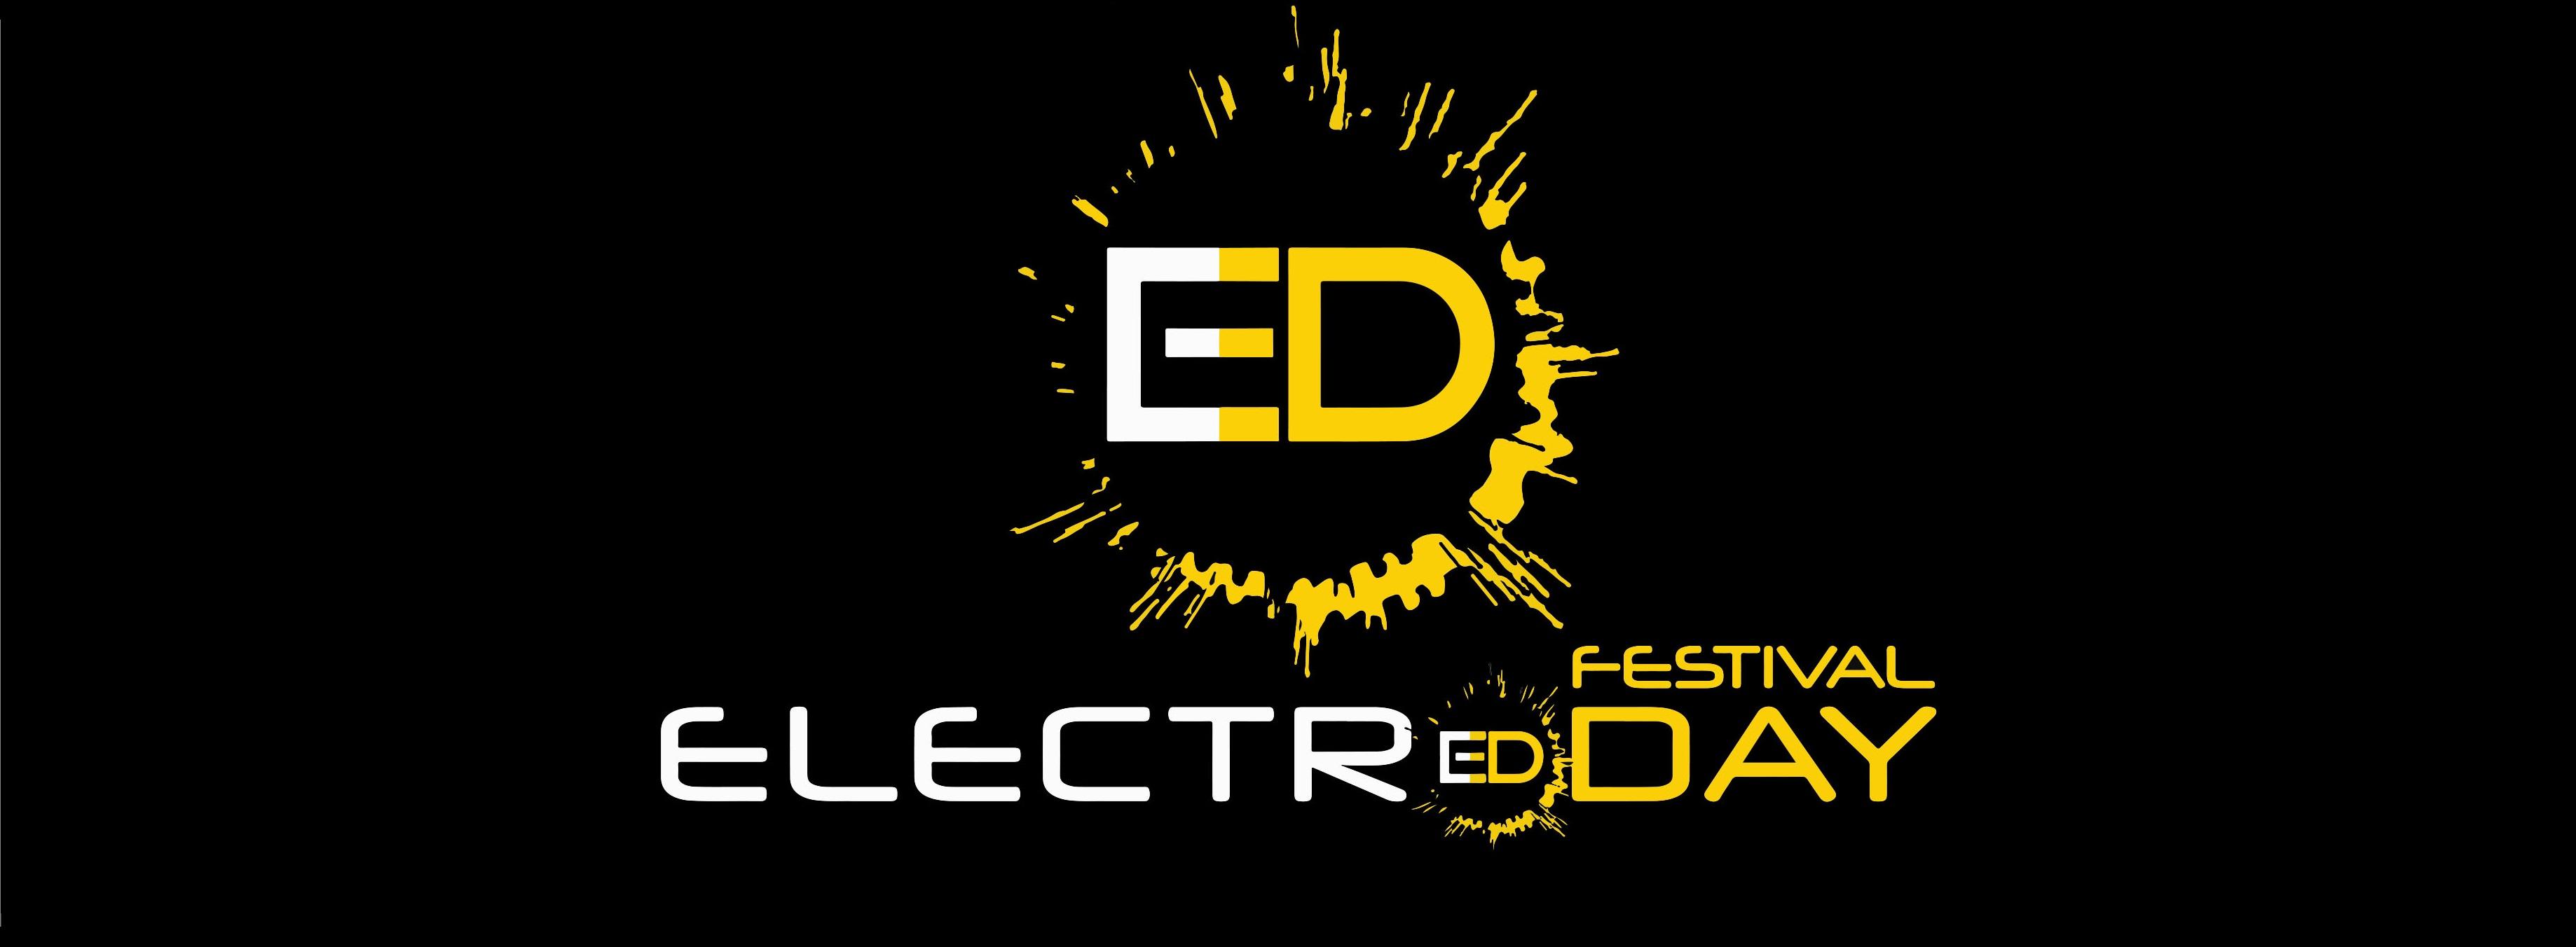 Electroday Festival Edition 2019